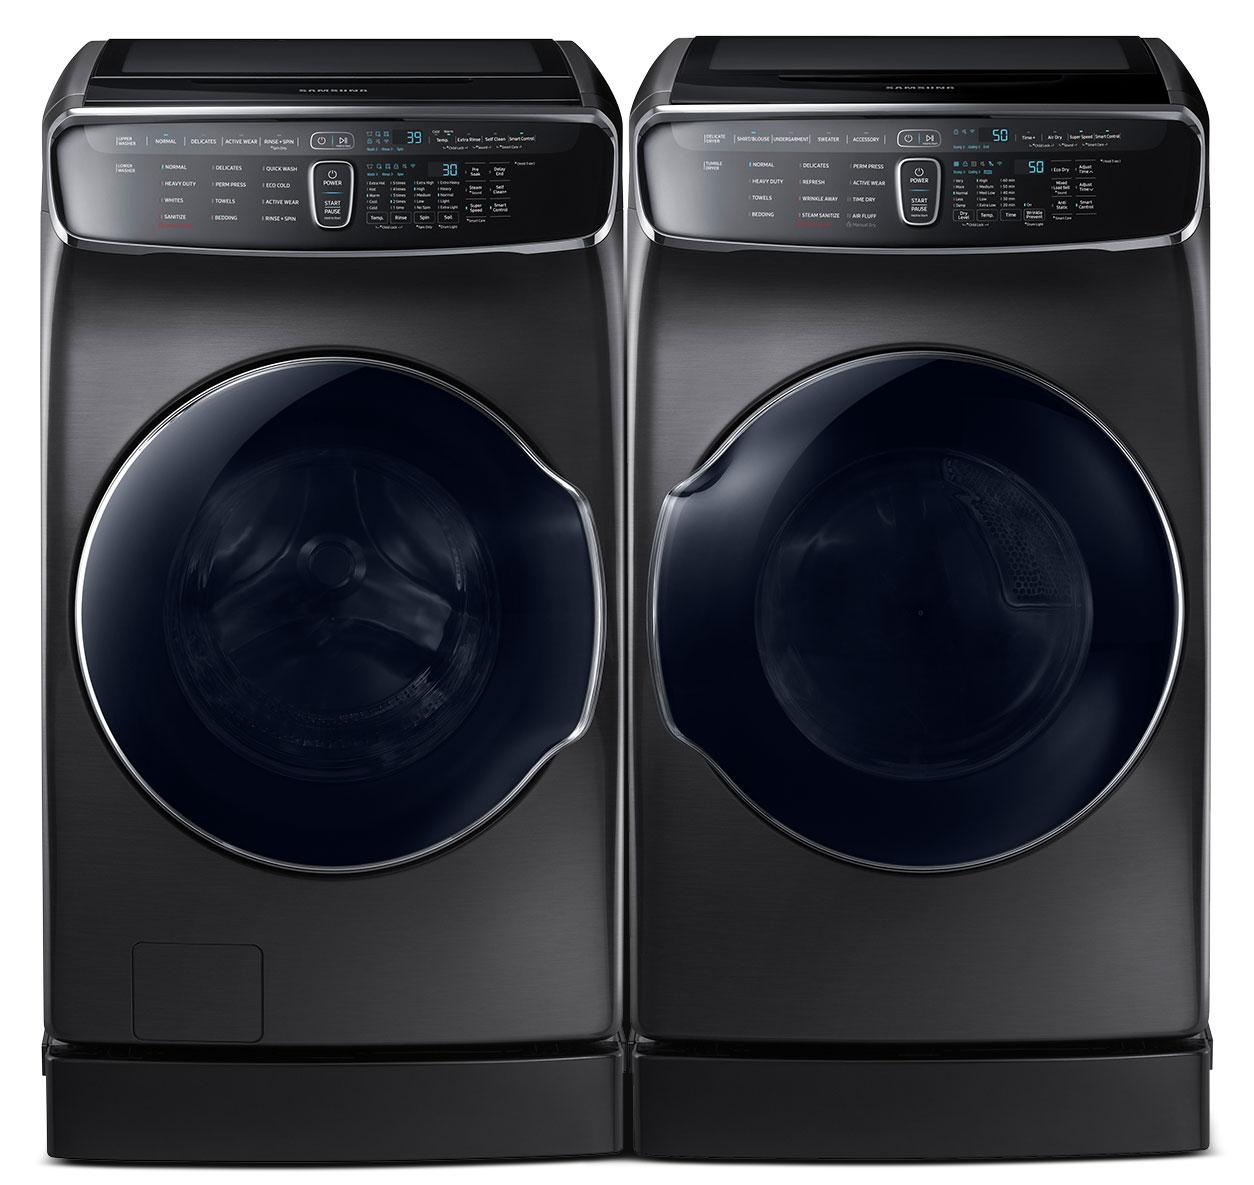 Samsung Laundry - WV60M9900AV/A5 / DVE60M9900V/AC